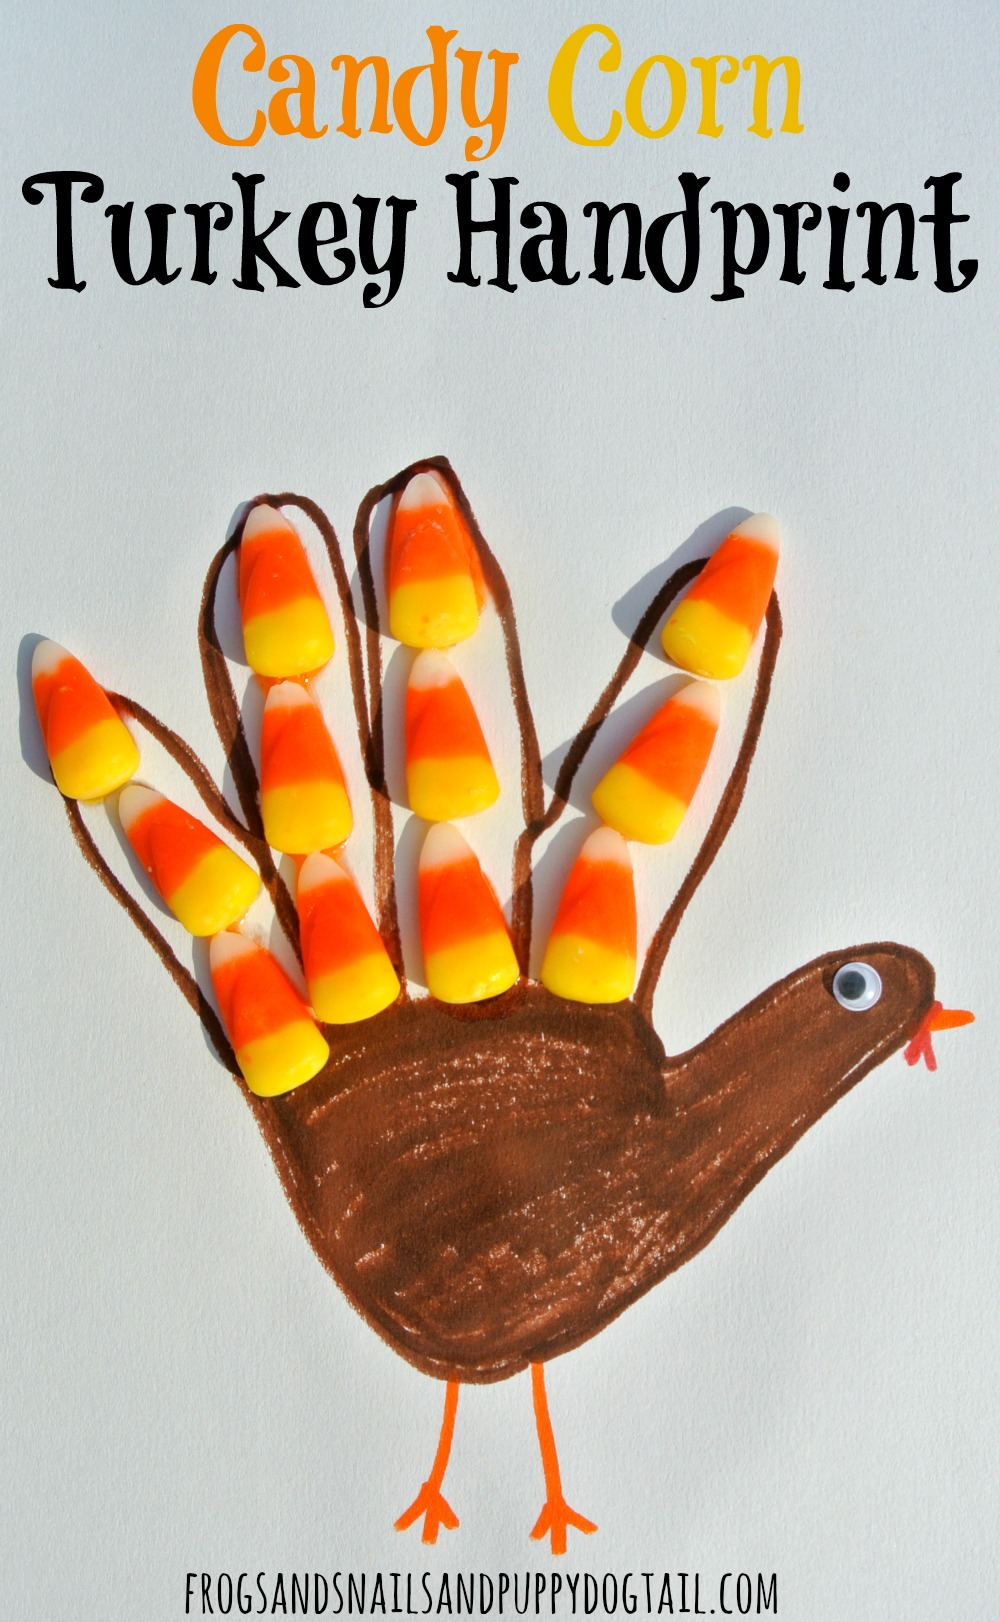 Candy Corn Turkey- Classic Handprint Art for Thanksgiving #handprintturkey